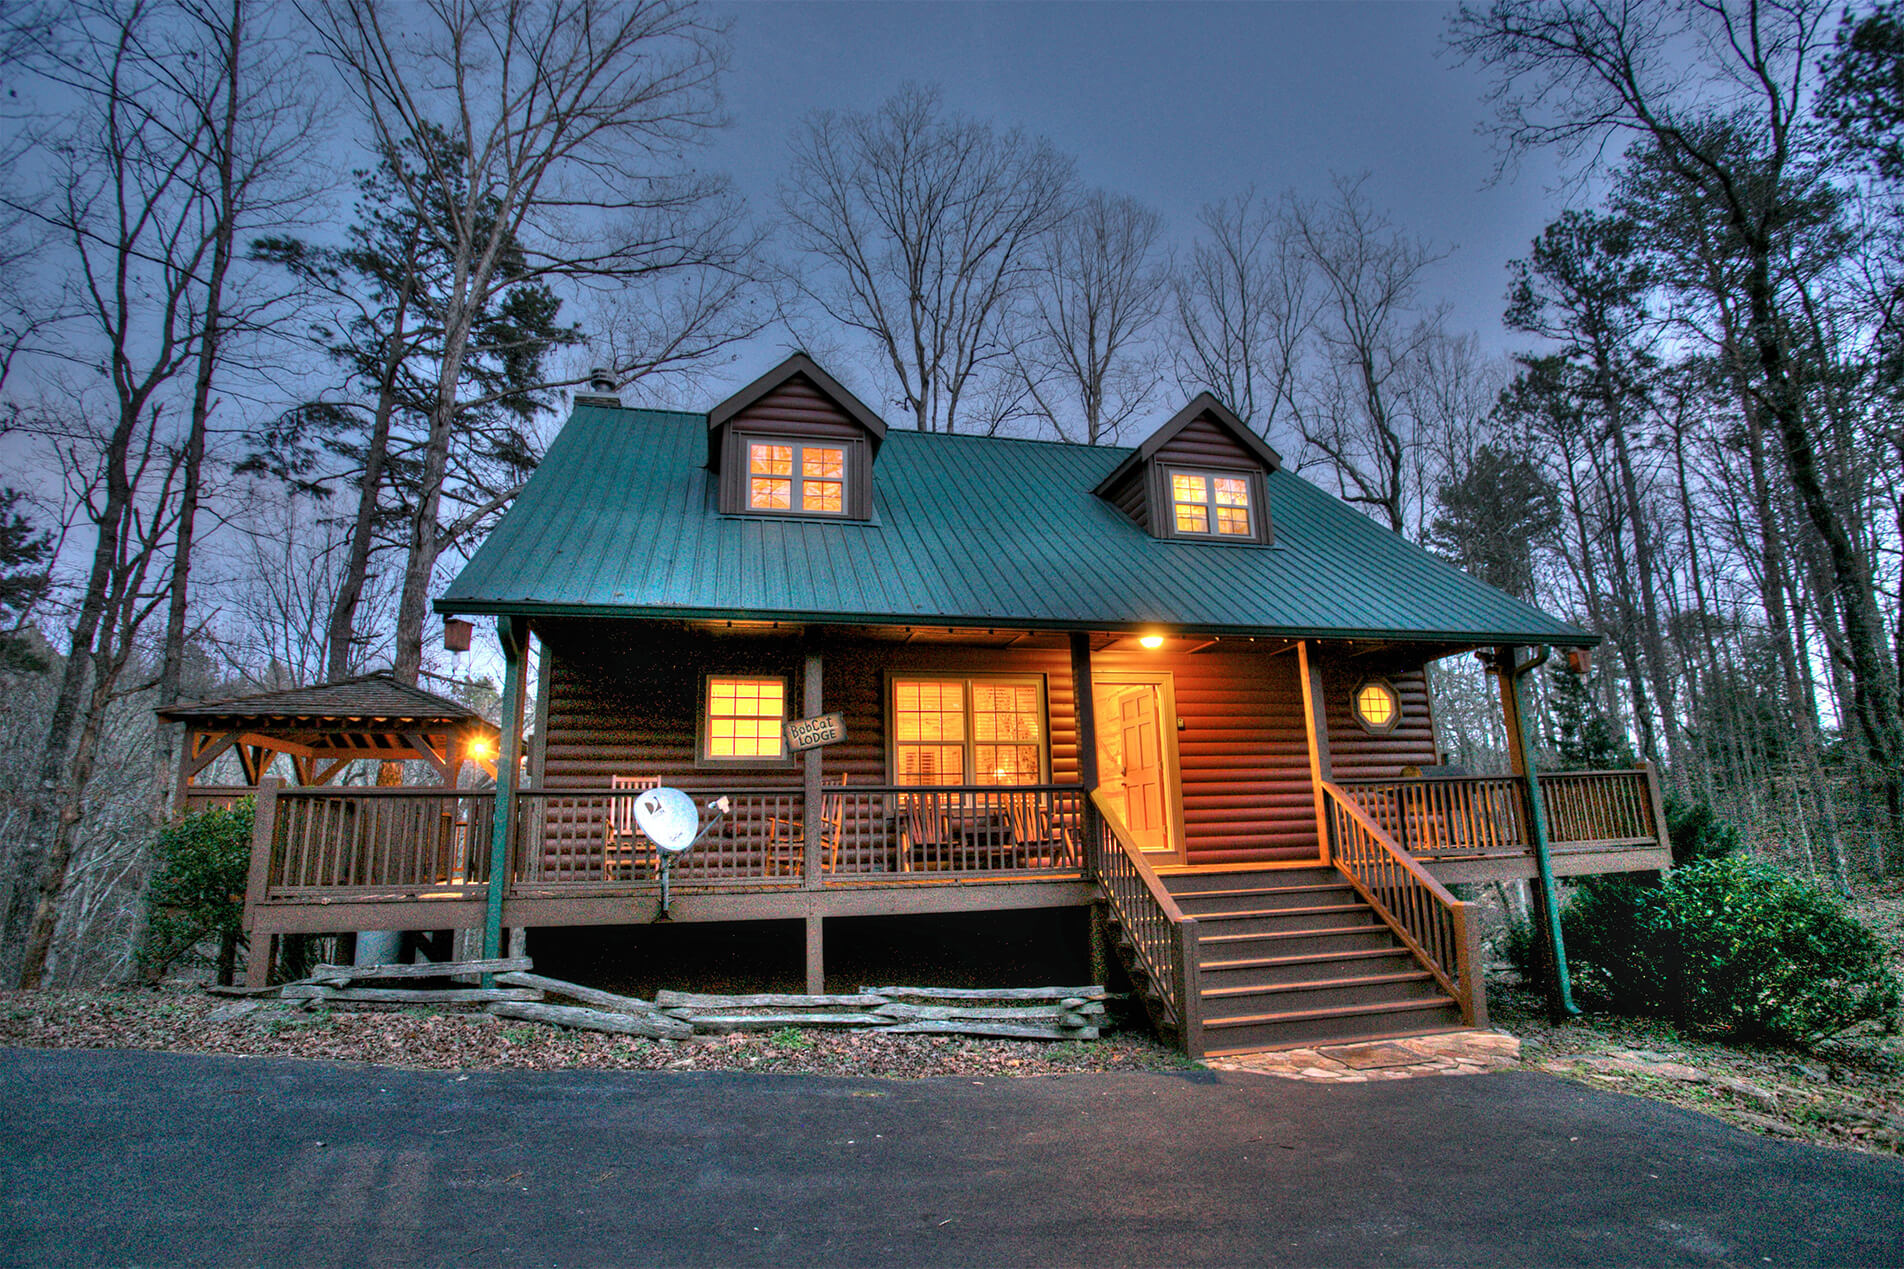 Bobcat-Lodge-Cedar-Creek-Cabin-Rentals-Helen-Georgia-top-banner-1904